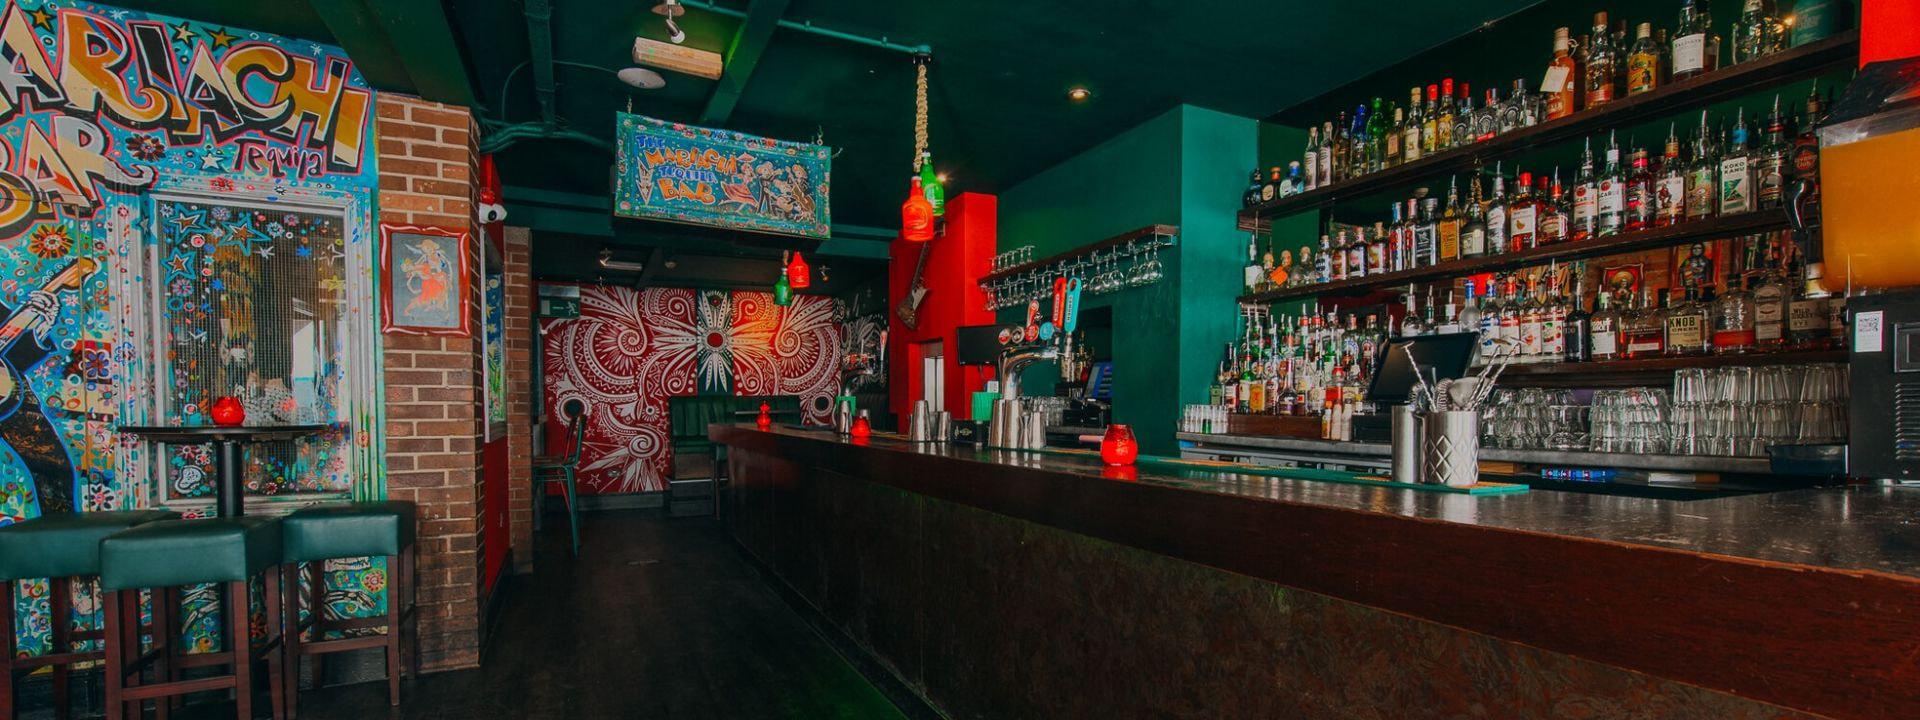 Verve Bar Leeds